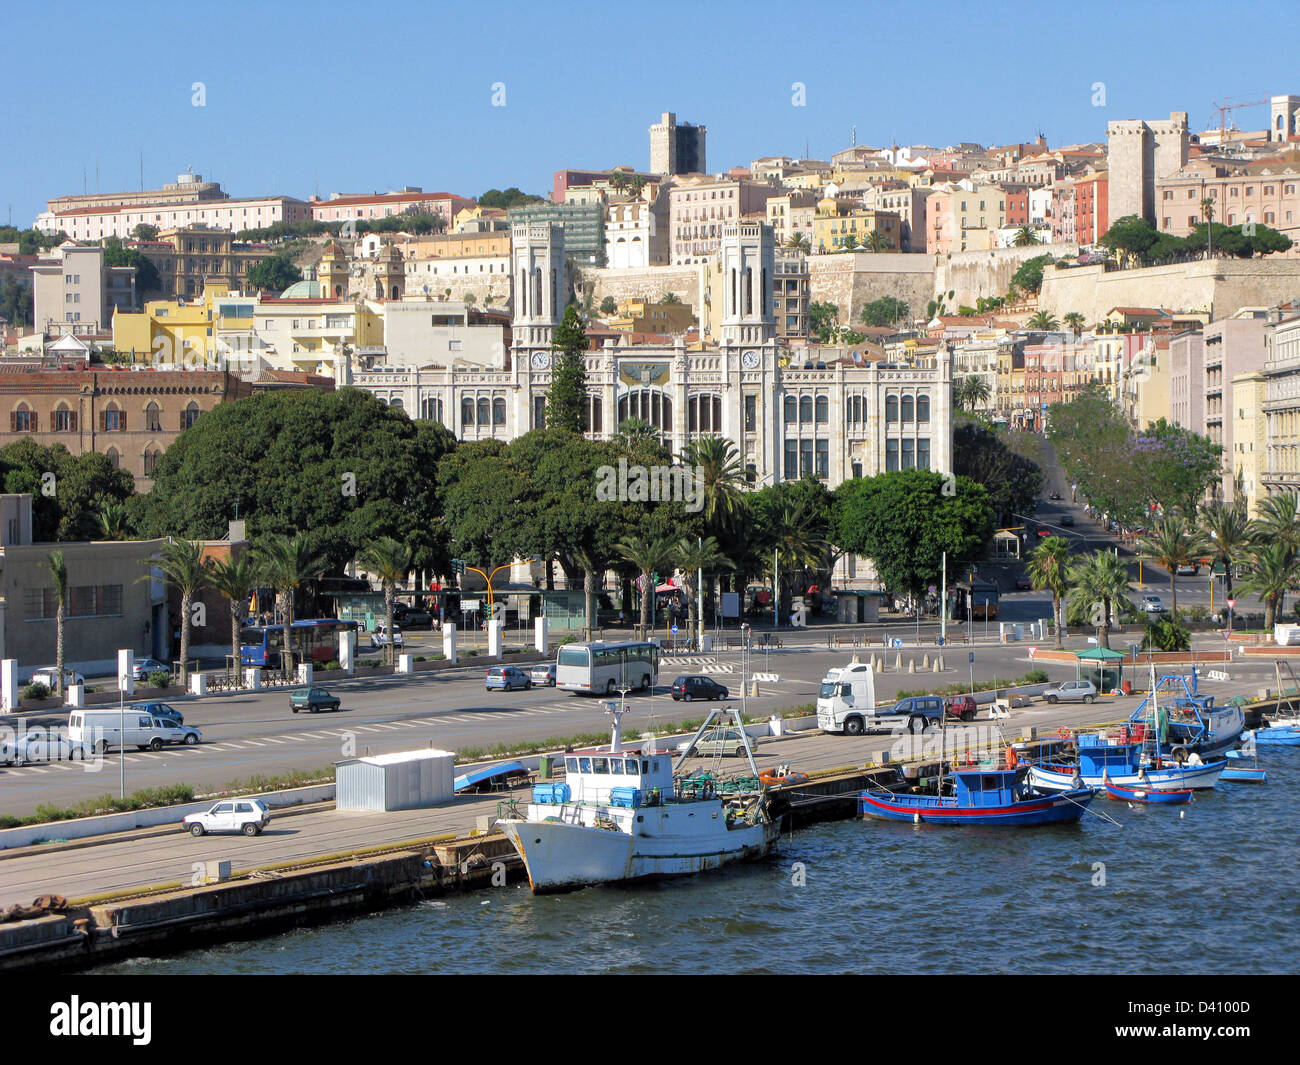 Sardinia cagliari marina district via stock photos for Isola arreda cagliari